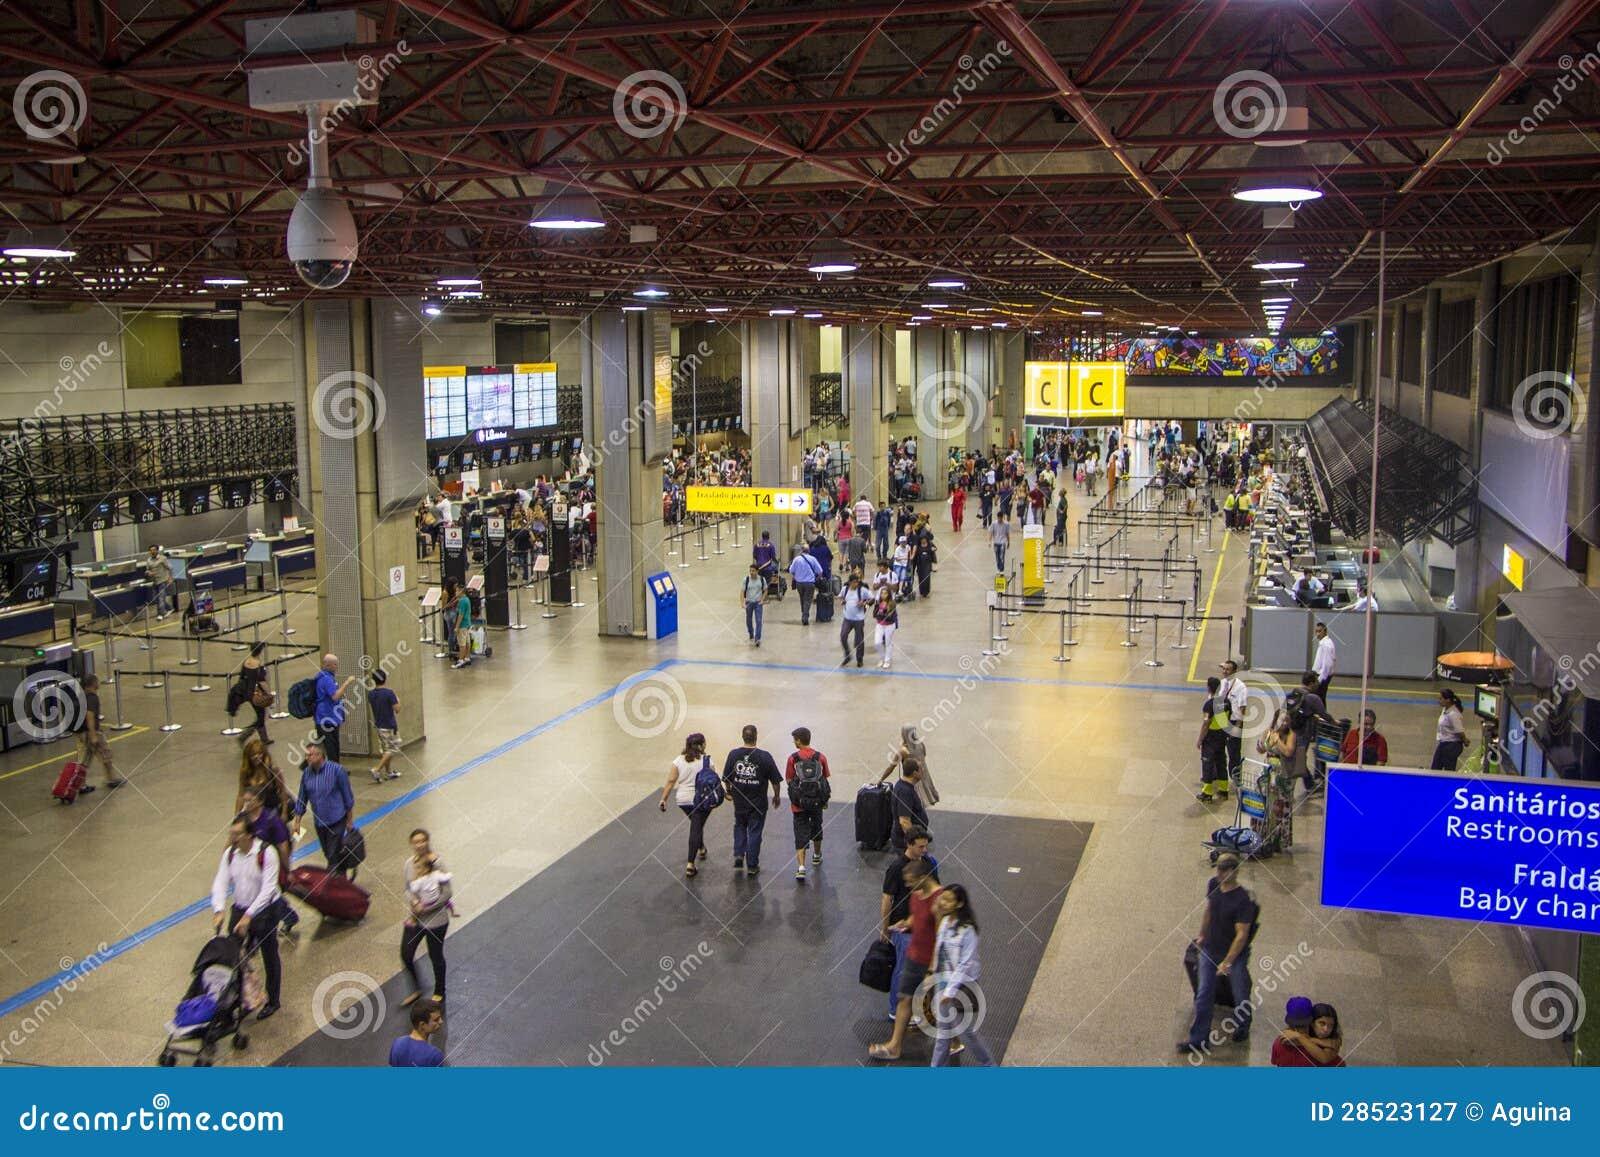 Aeroporto Gru : Aeroporto internazionale di são paulo guarulhos brasile